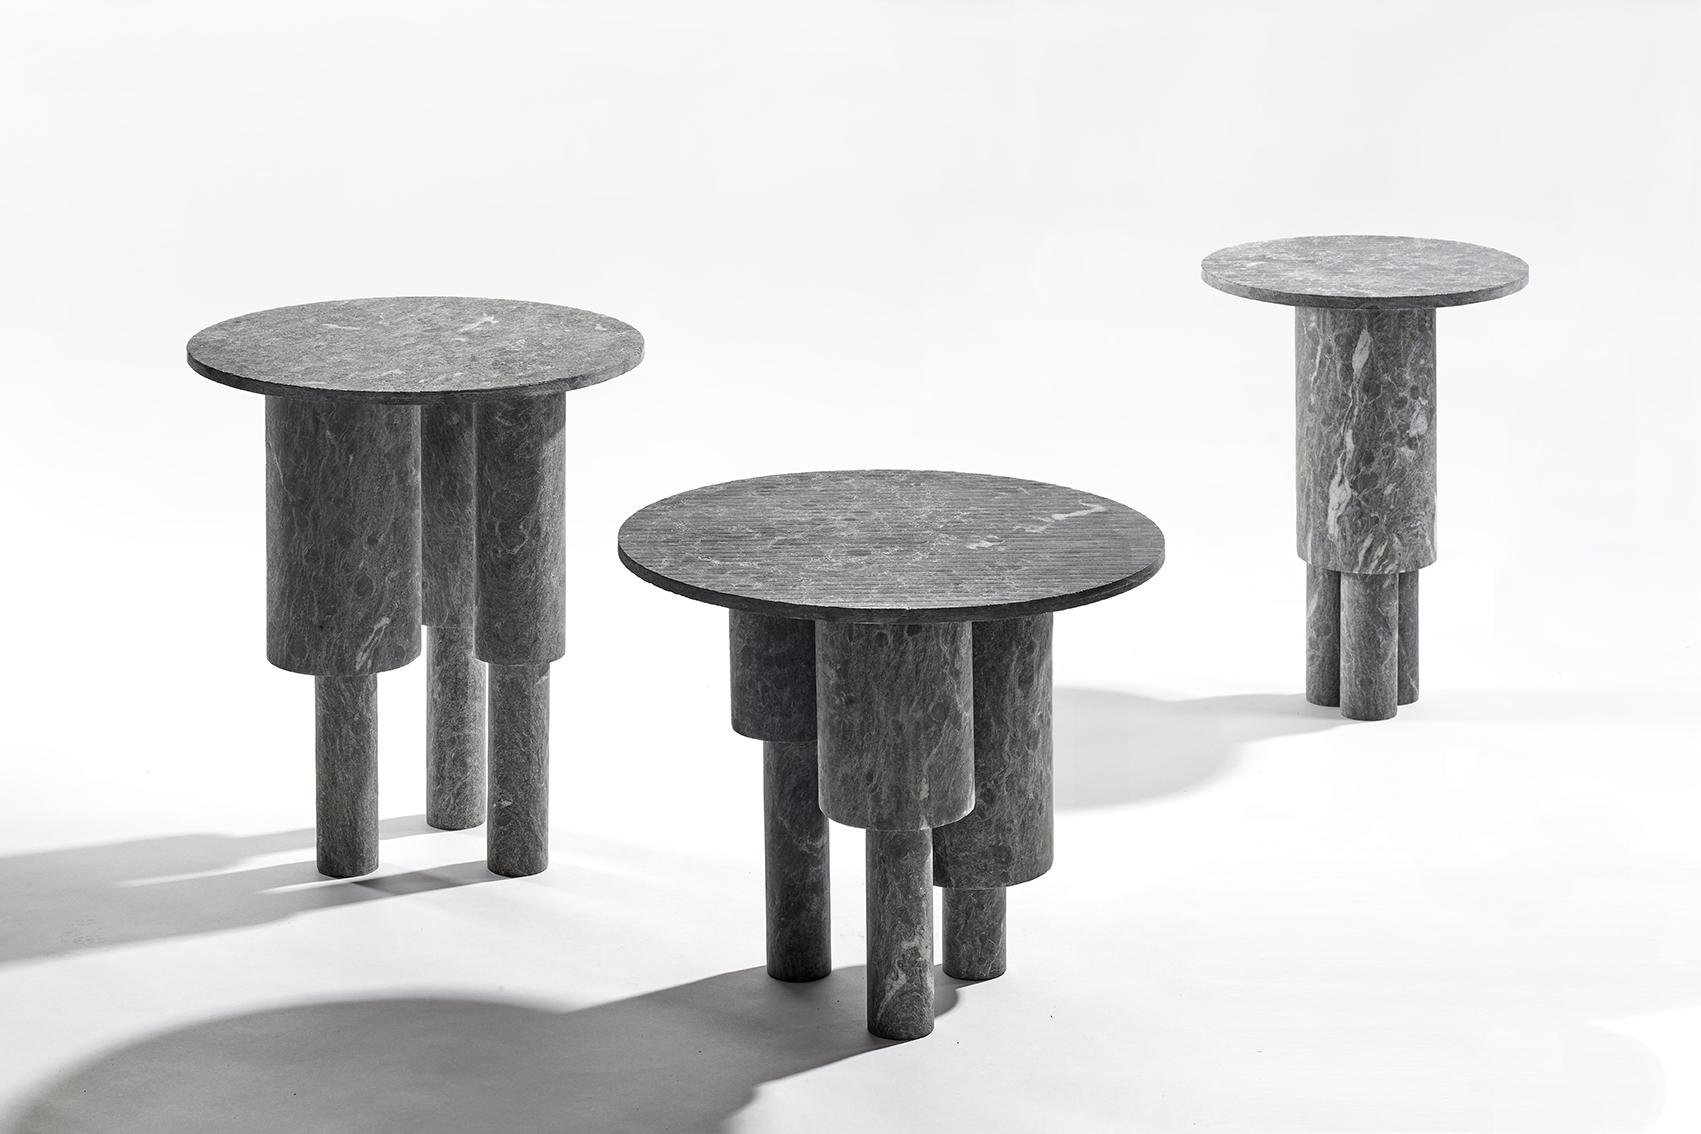 munoz-josefina-design-marble-black_tables-2.jpg